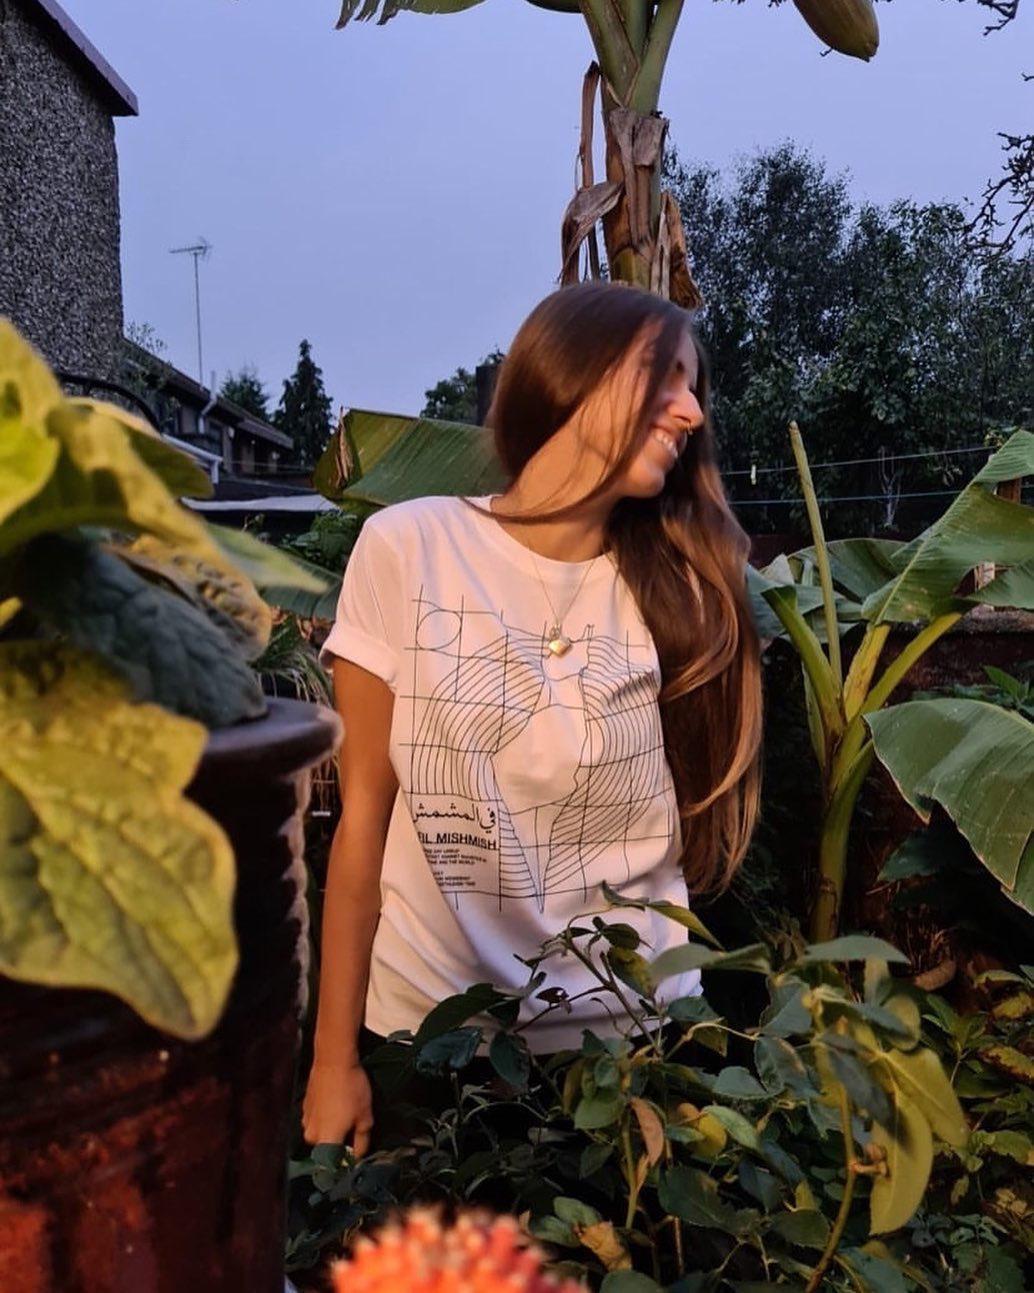 everpress-blog-creating-a-neighbourhood-with-radio-alhara-filmishmish